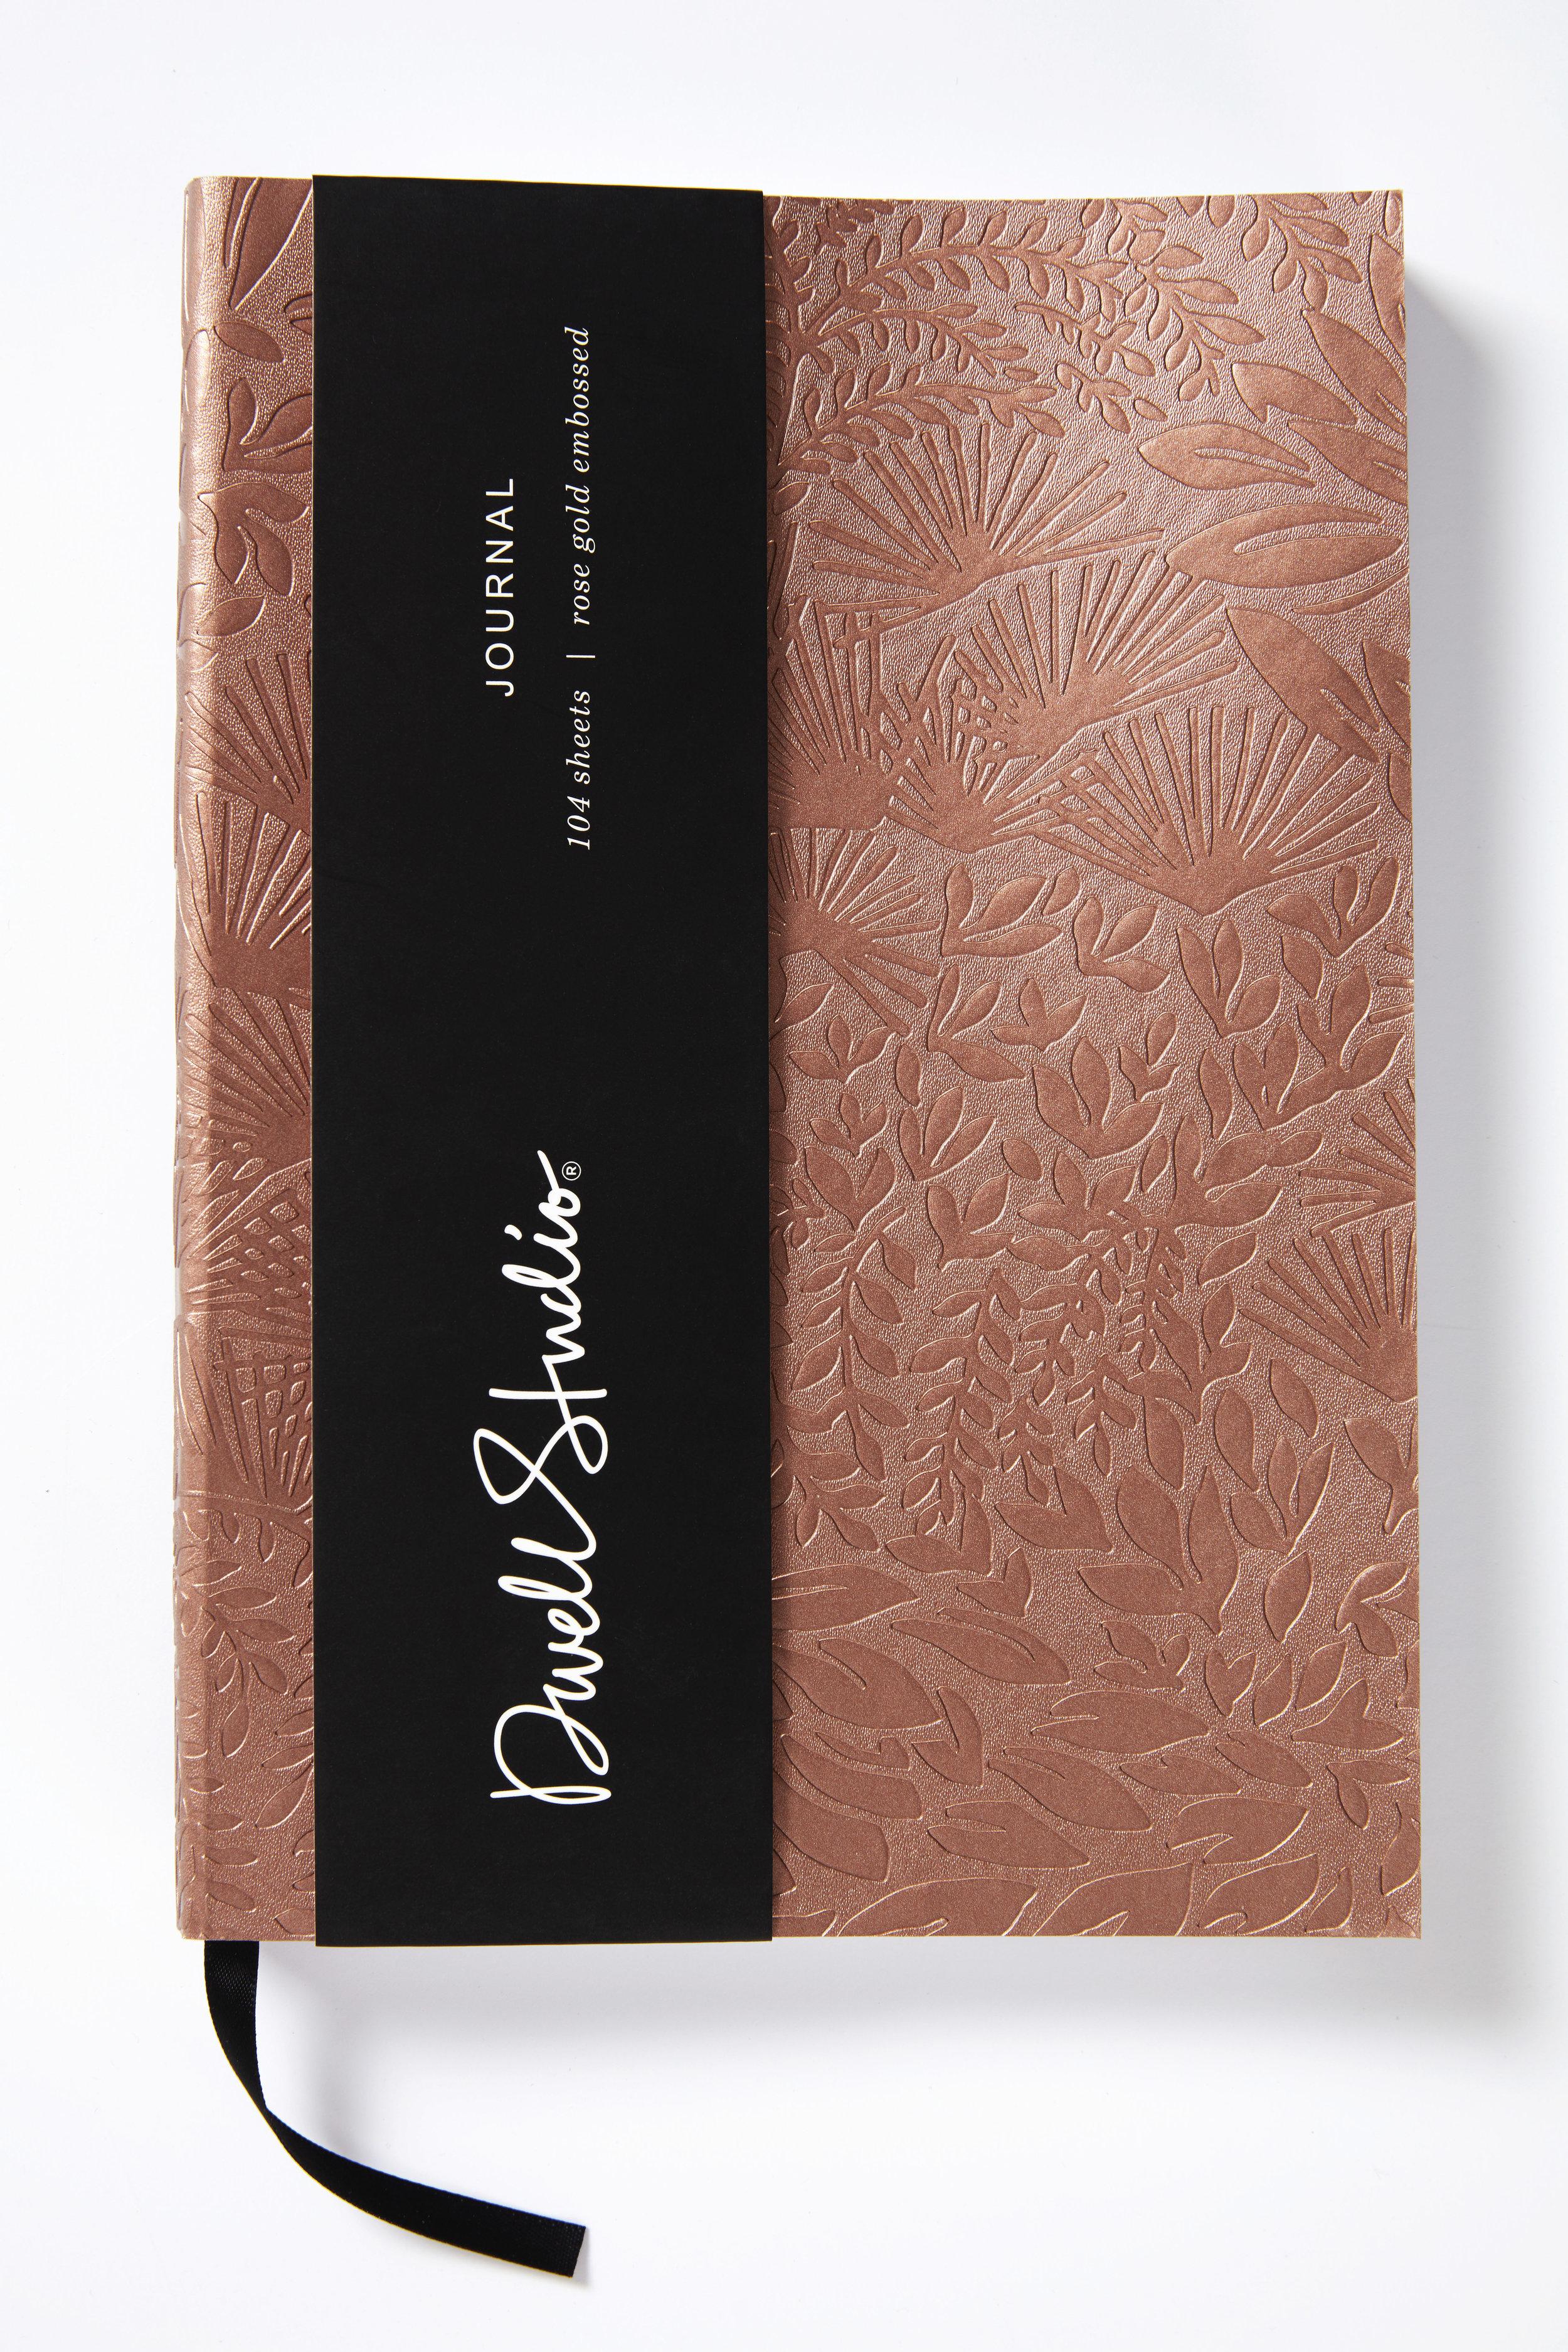 DS leatherette journal rose gold embossed.jpg